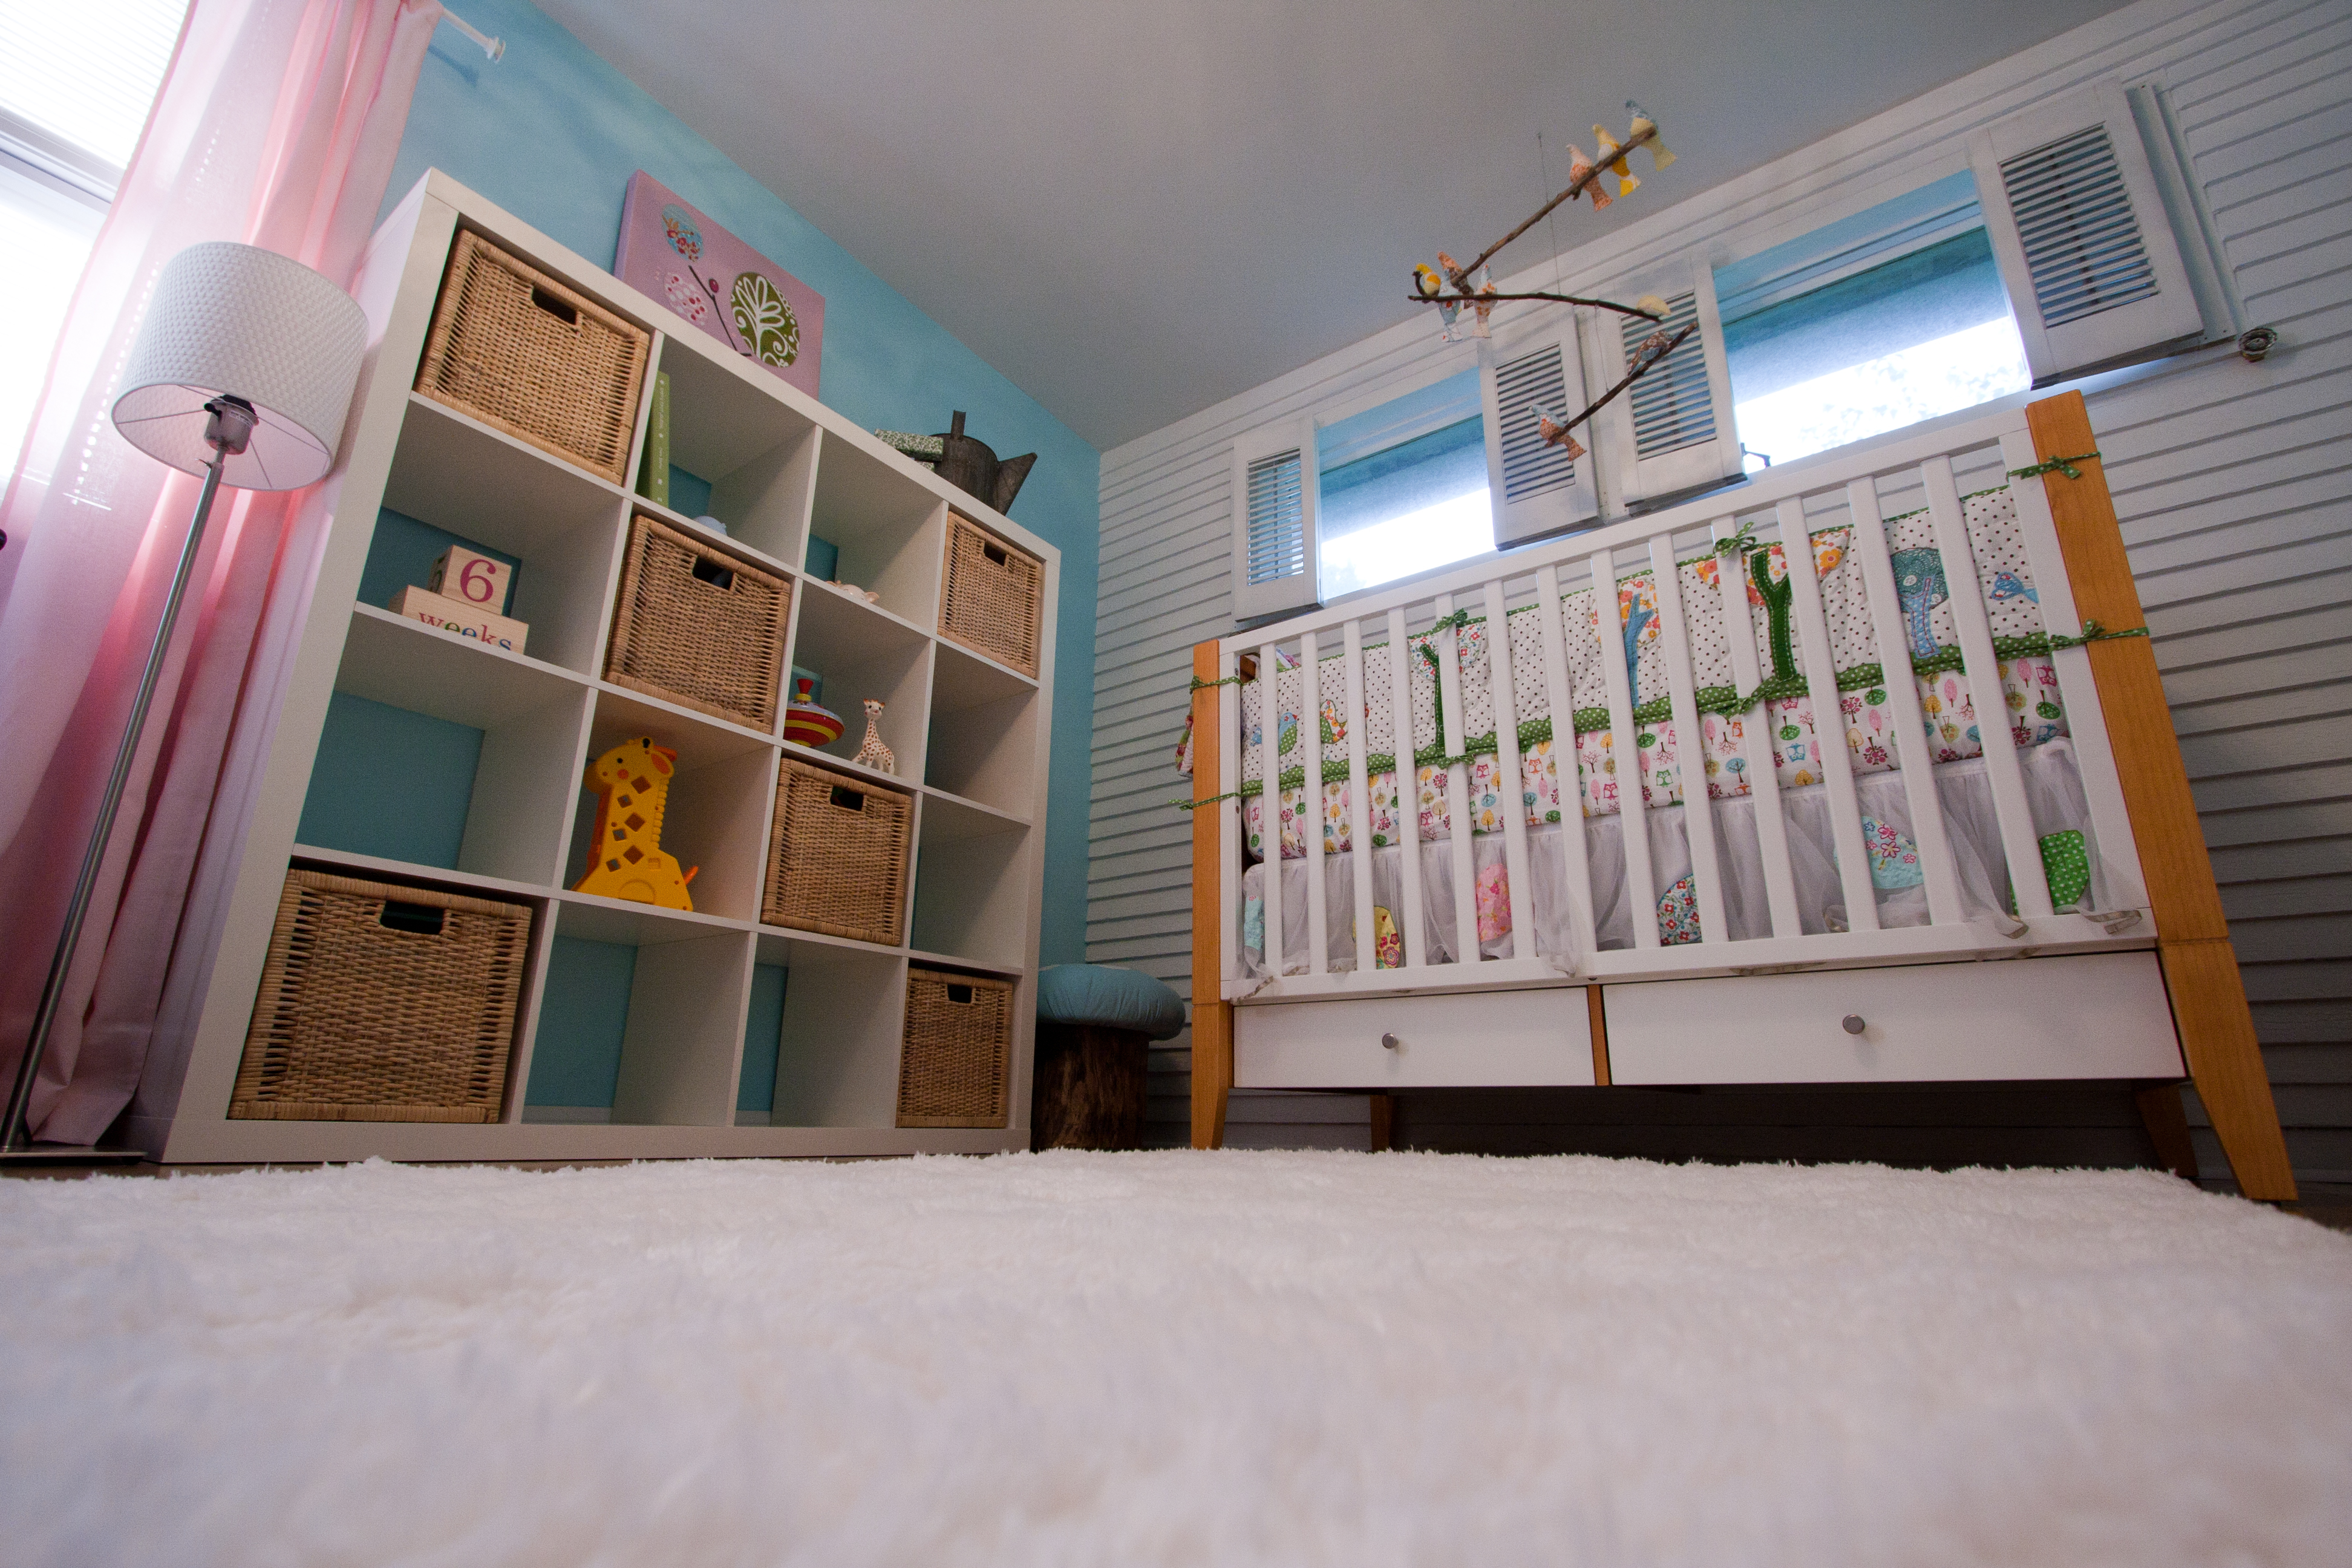 Thereu0027s Ditching the crib Montessori begins